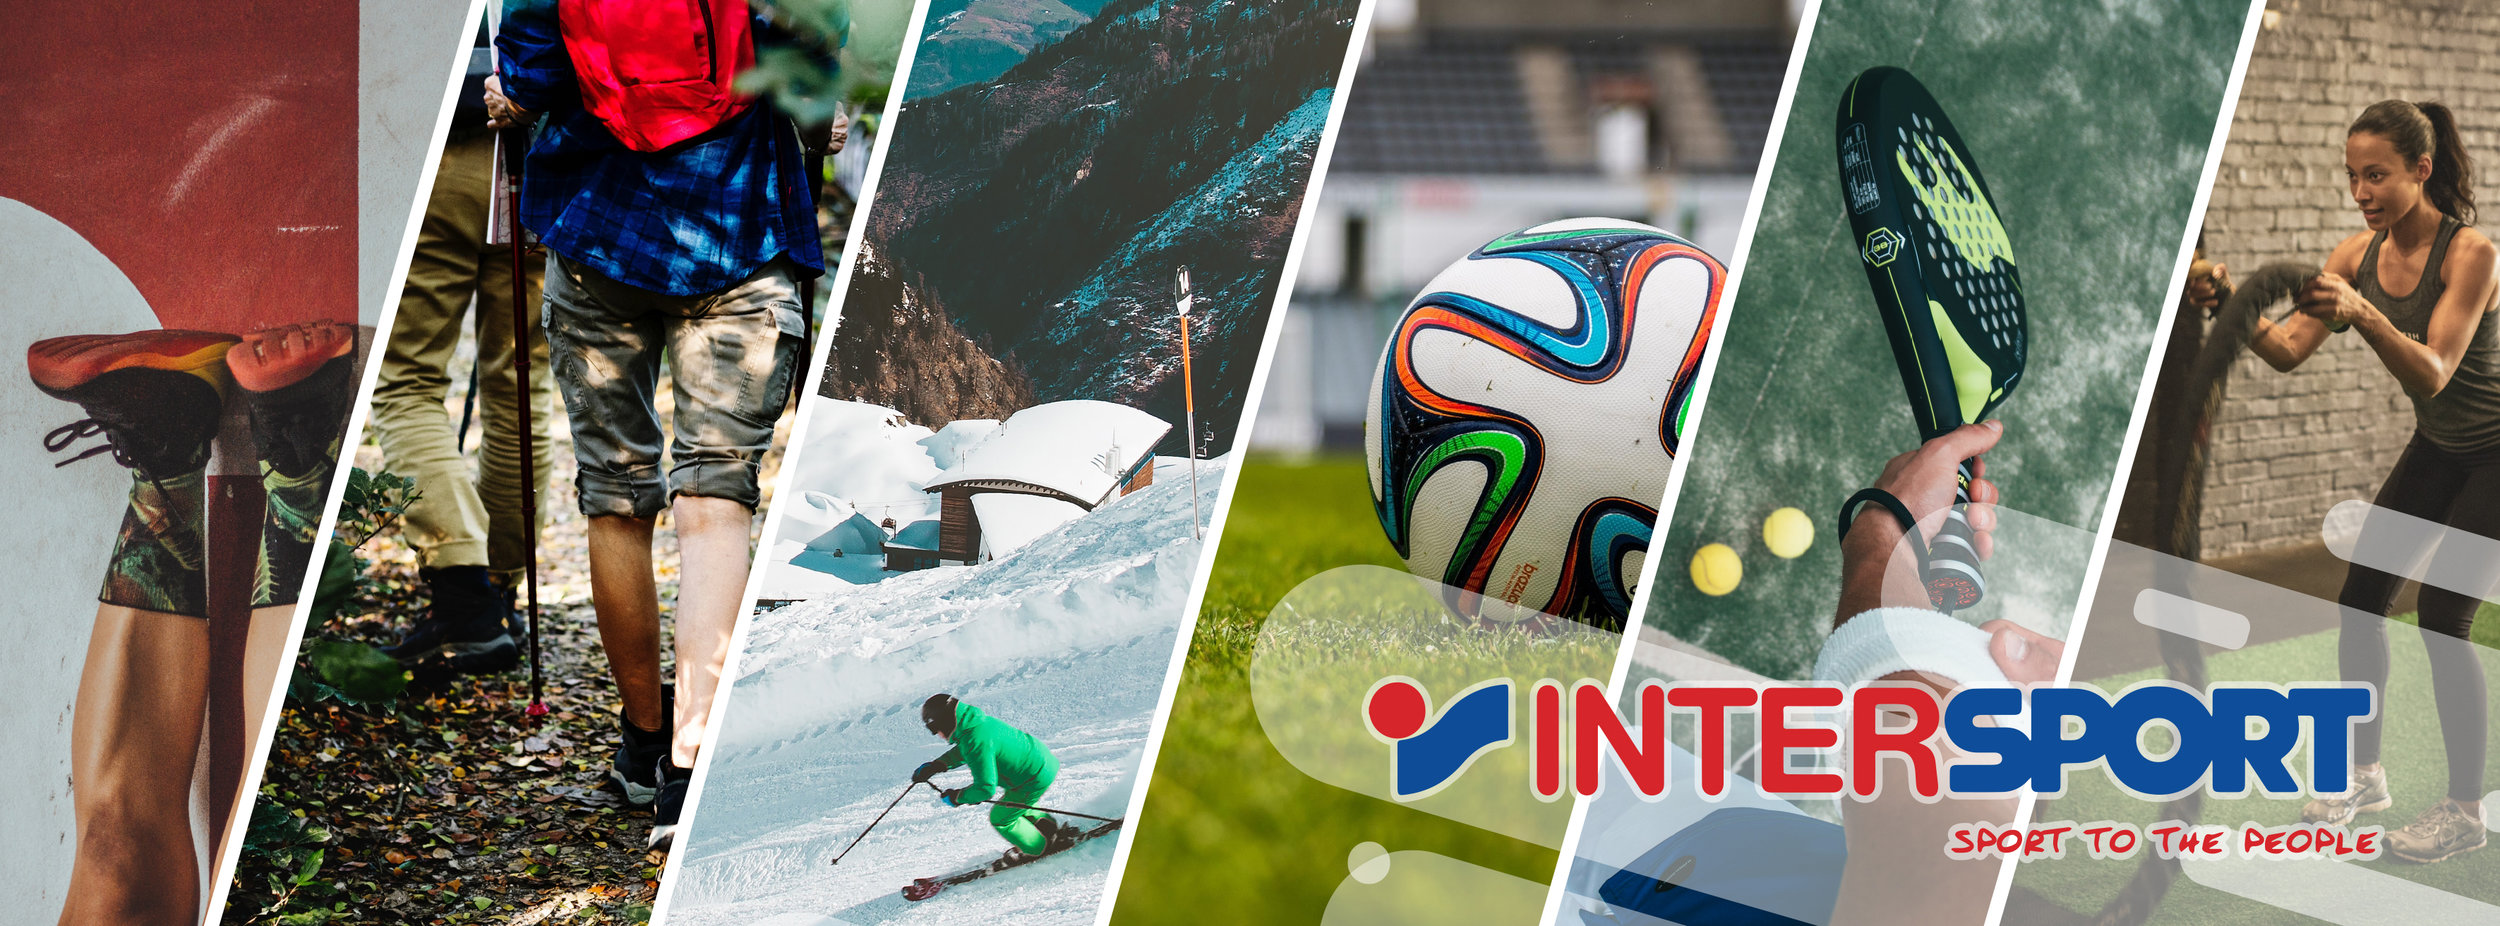 banner intersport 2019_Holyoke Paper Co